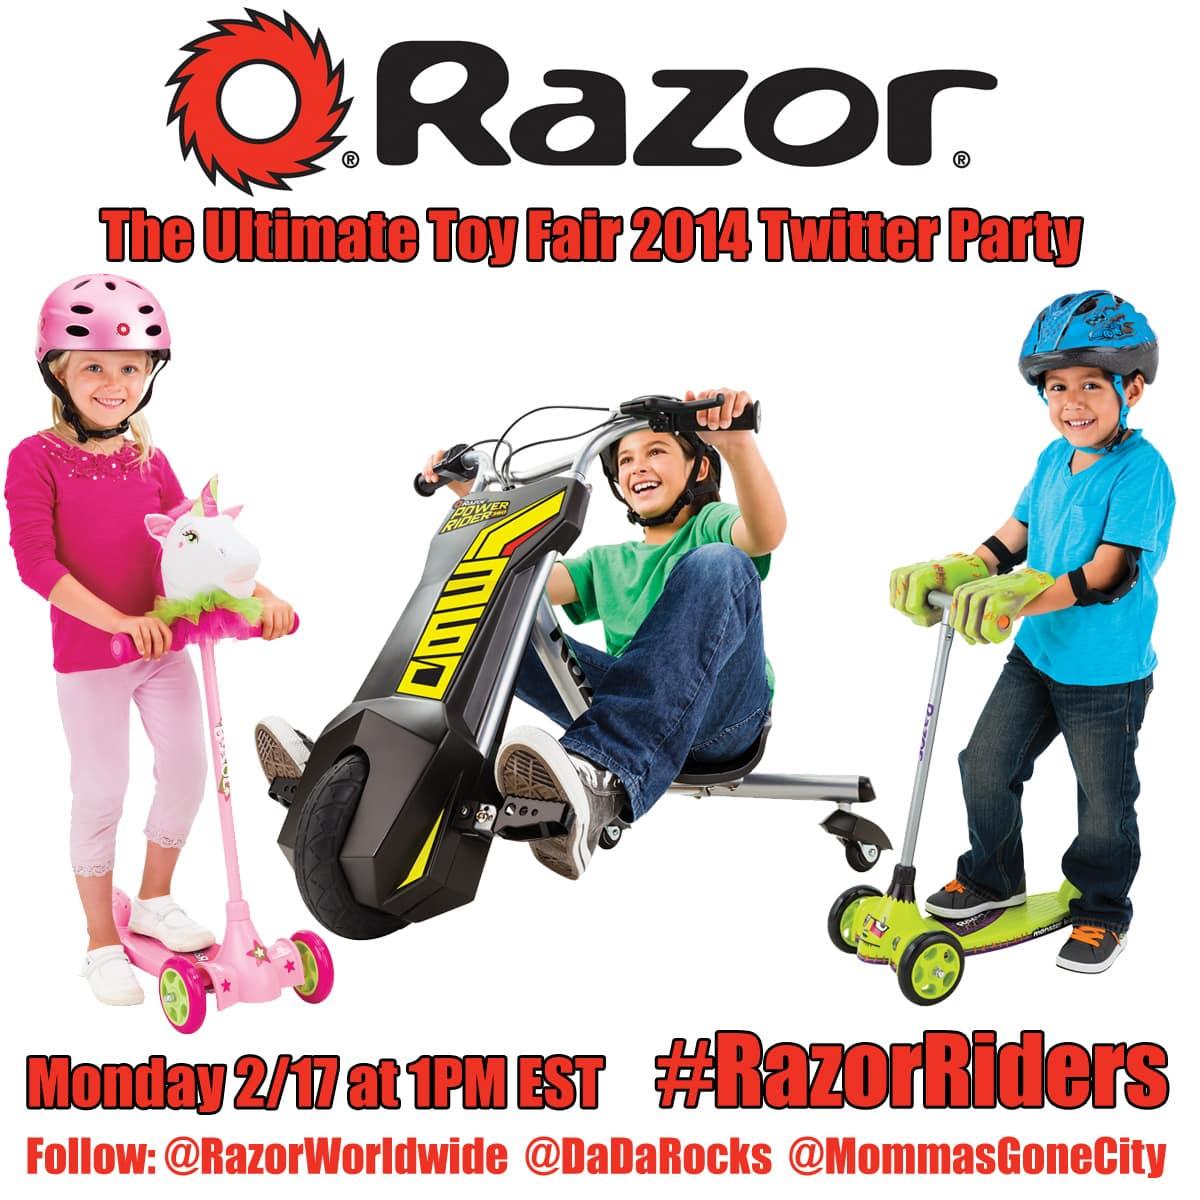 #RazorRiders Toy Fair 2014 Twitter Party!